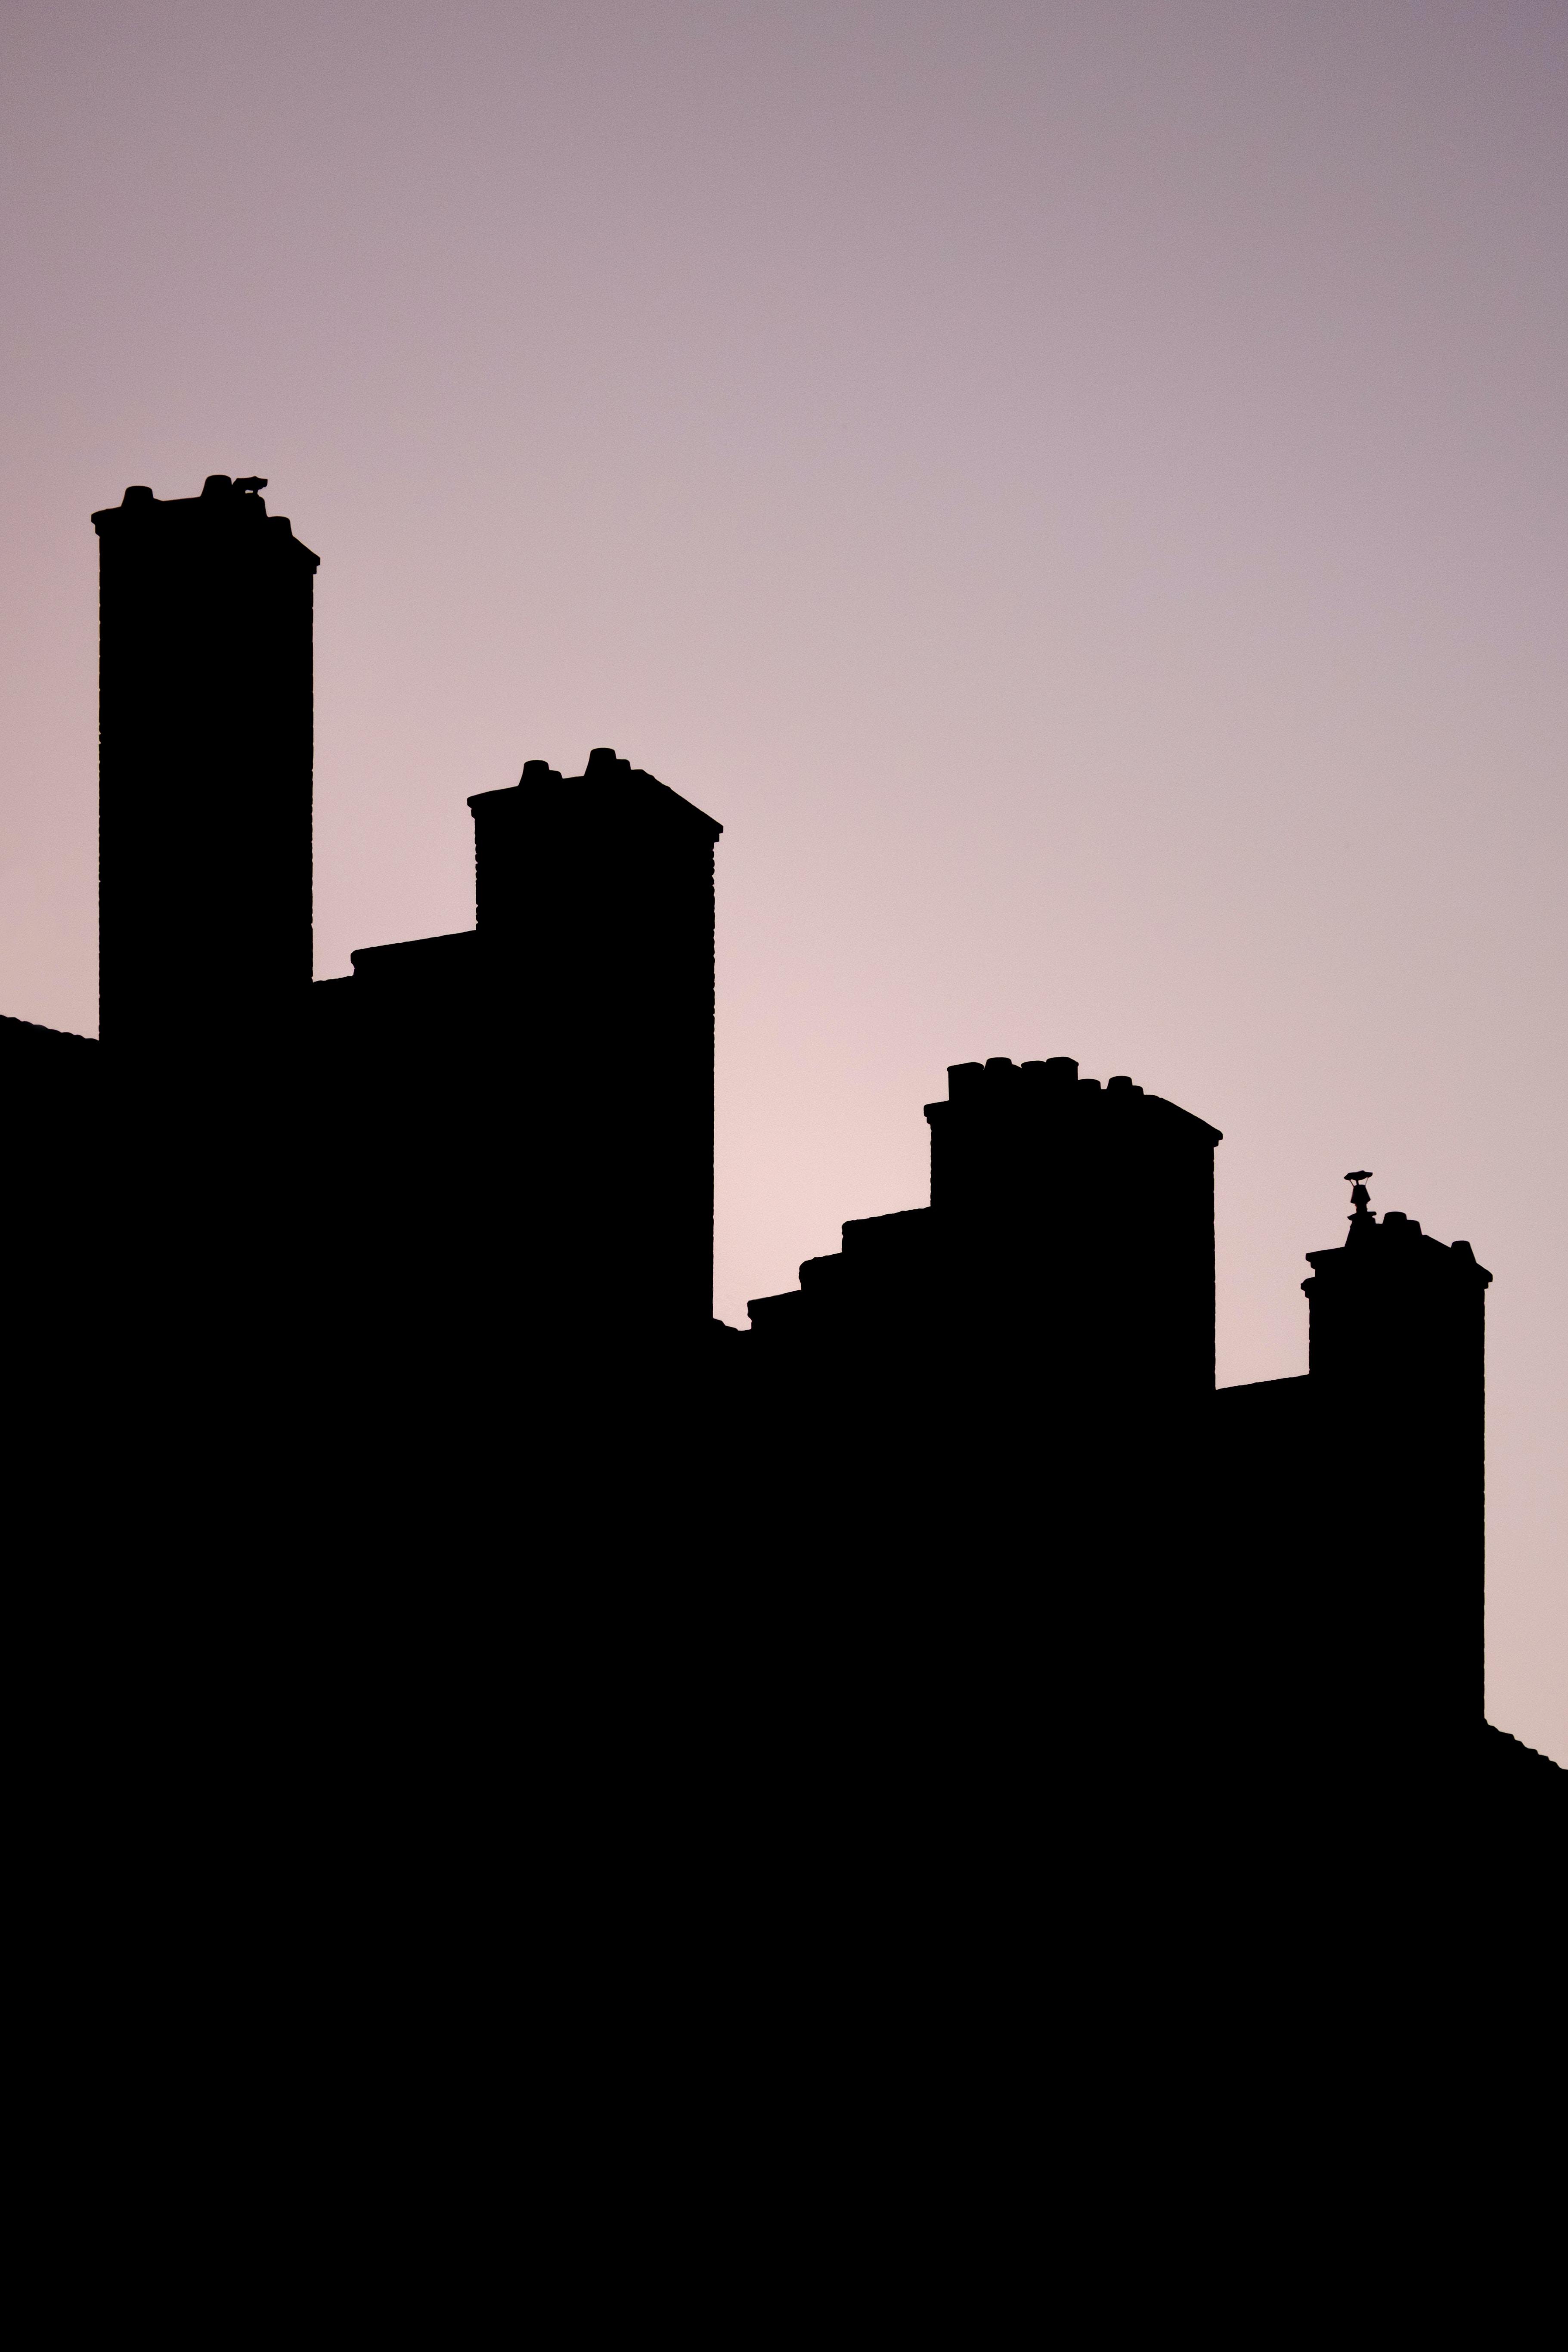 silhouette of chimneys